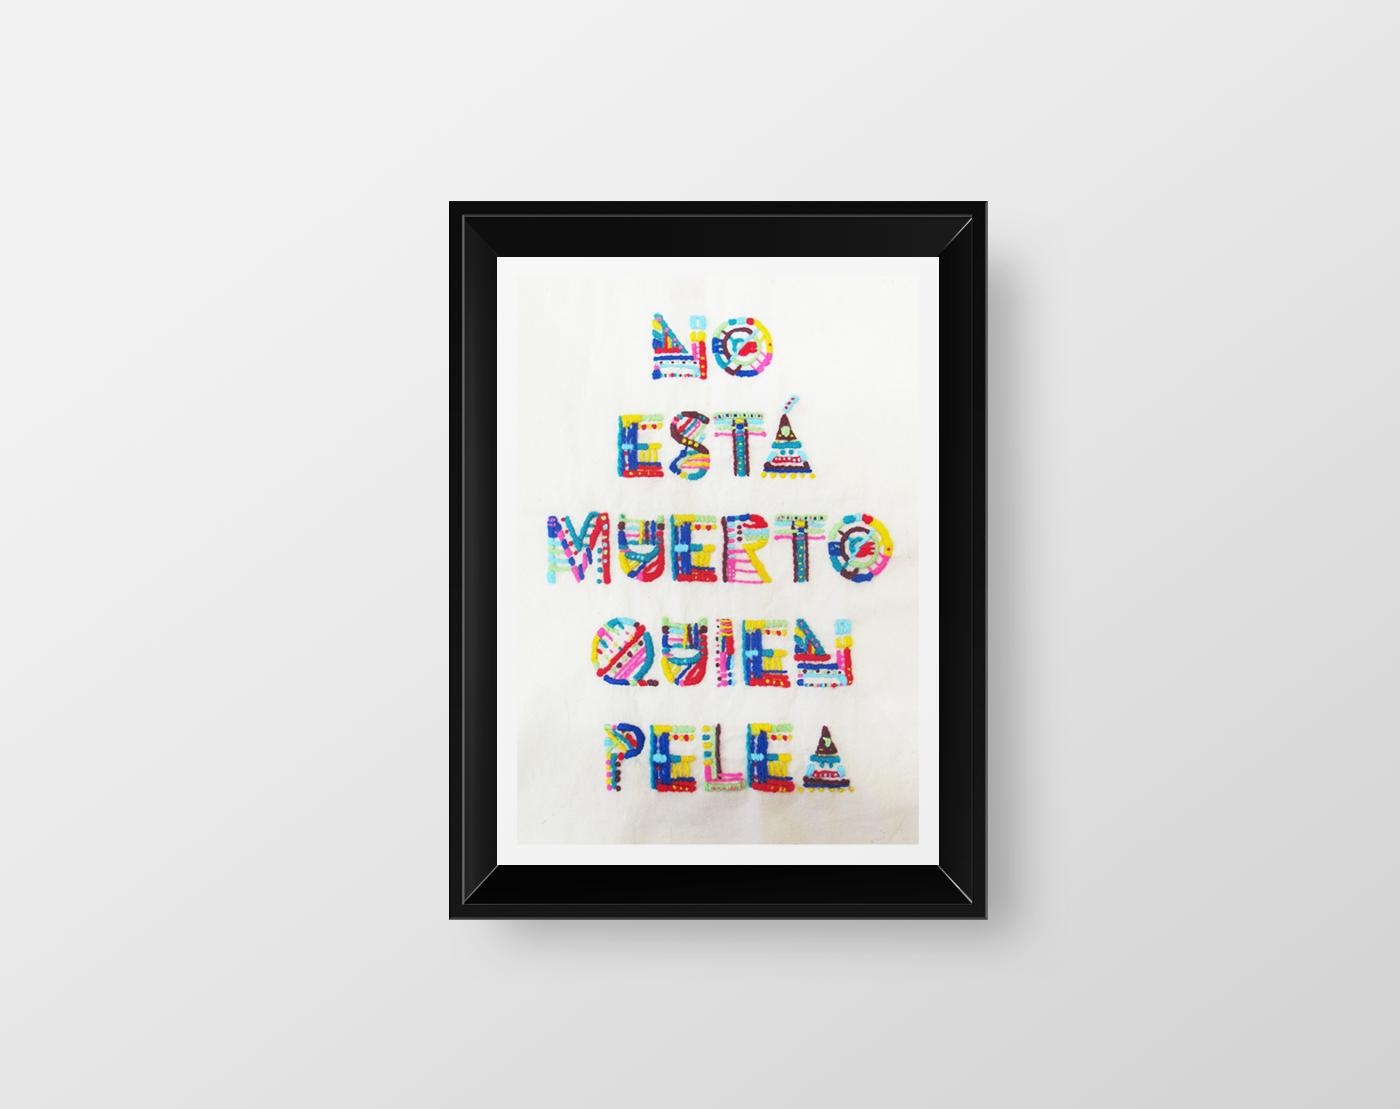 Color art tipografia - Embroidery By Manu Aparicio